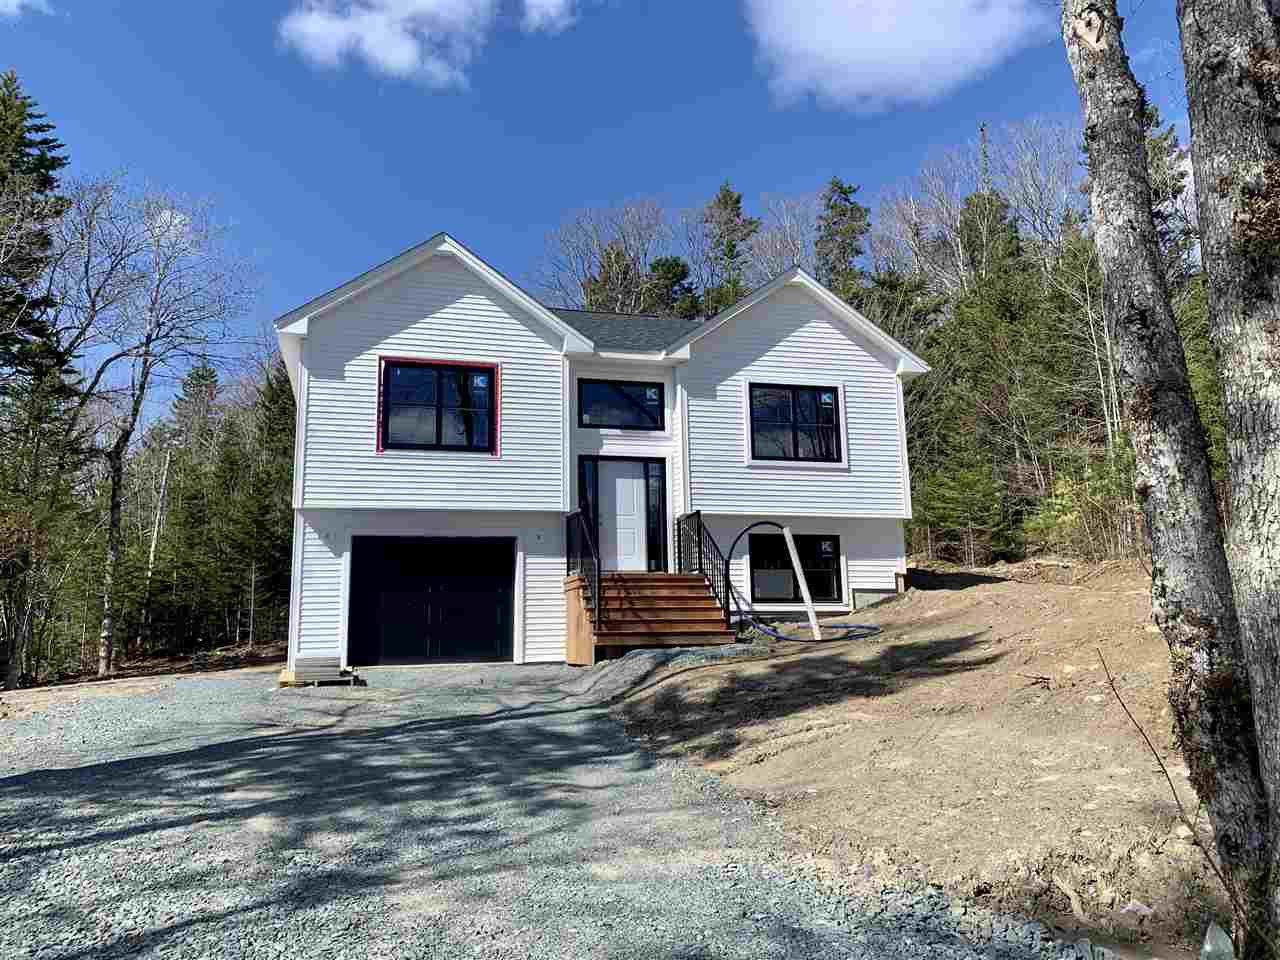 Main Photo: Lot 662 412 Gaspereau Run in Sackville: 26-Beaverbank, Upper Sackville Residential for sale (Halifax-Dartmouth)  : MLS®# 201925998